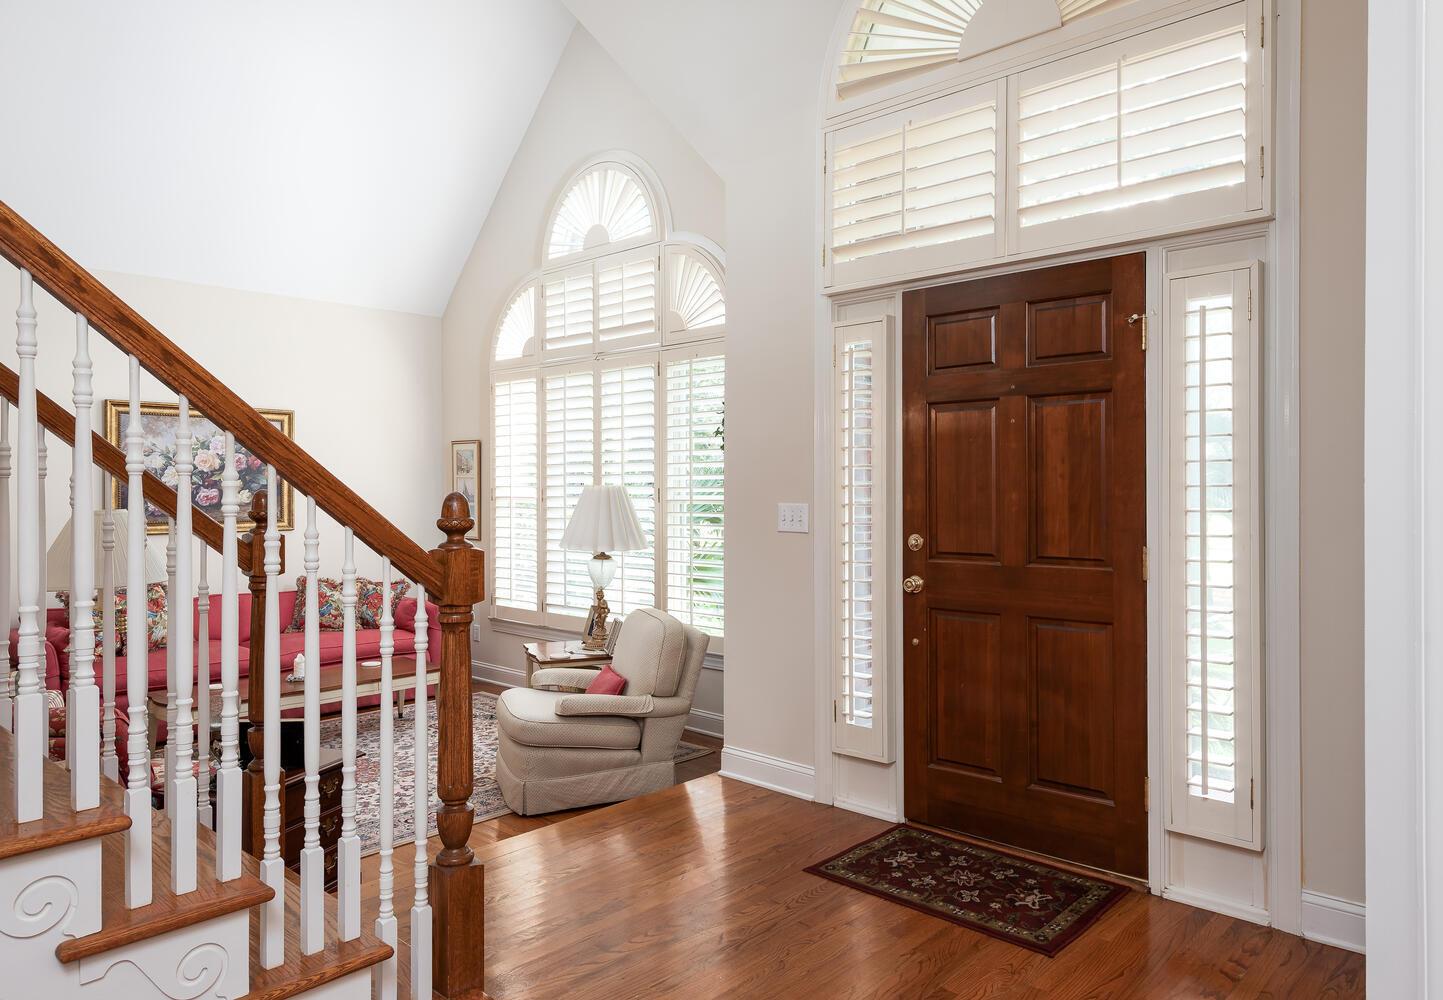 Dunes West Homes For Sale - 3616 Colonel Vanderhorst, Mount Pleasant, SC - 22